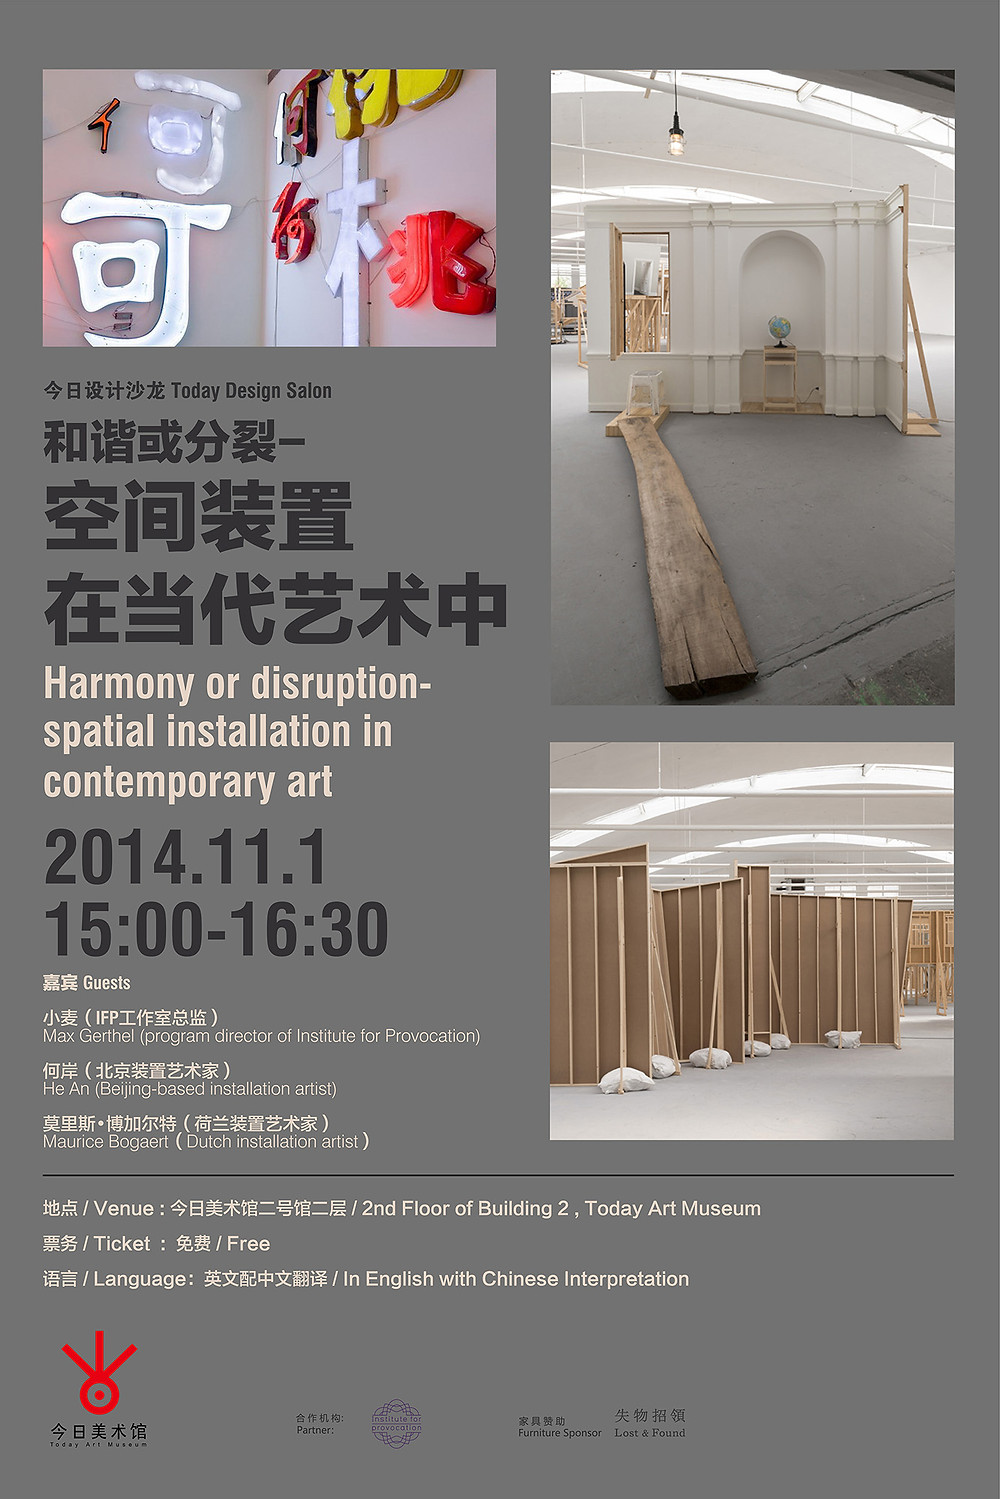 20141101_Salon-TodayArtMuseum_s.jpg